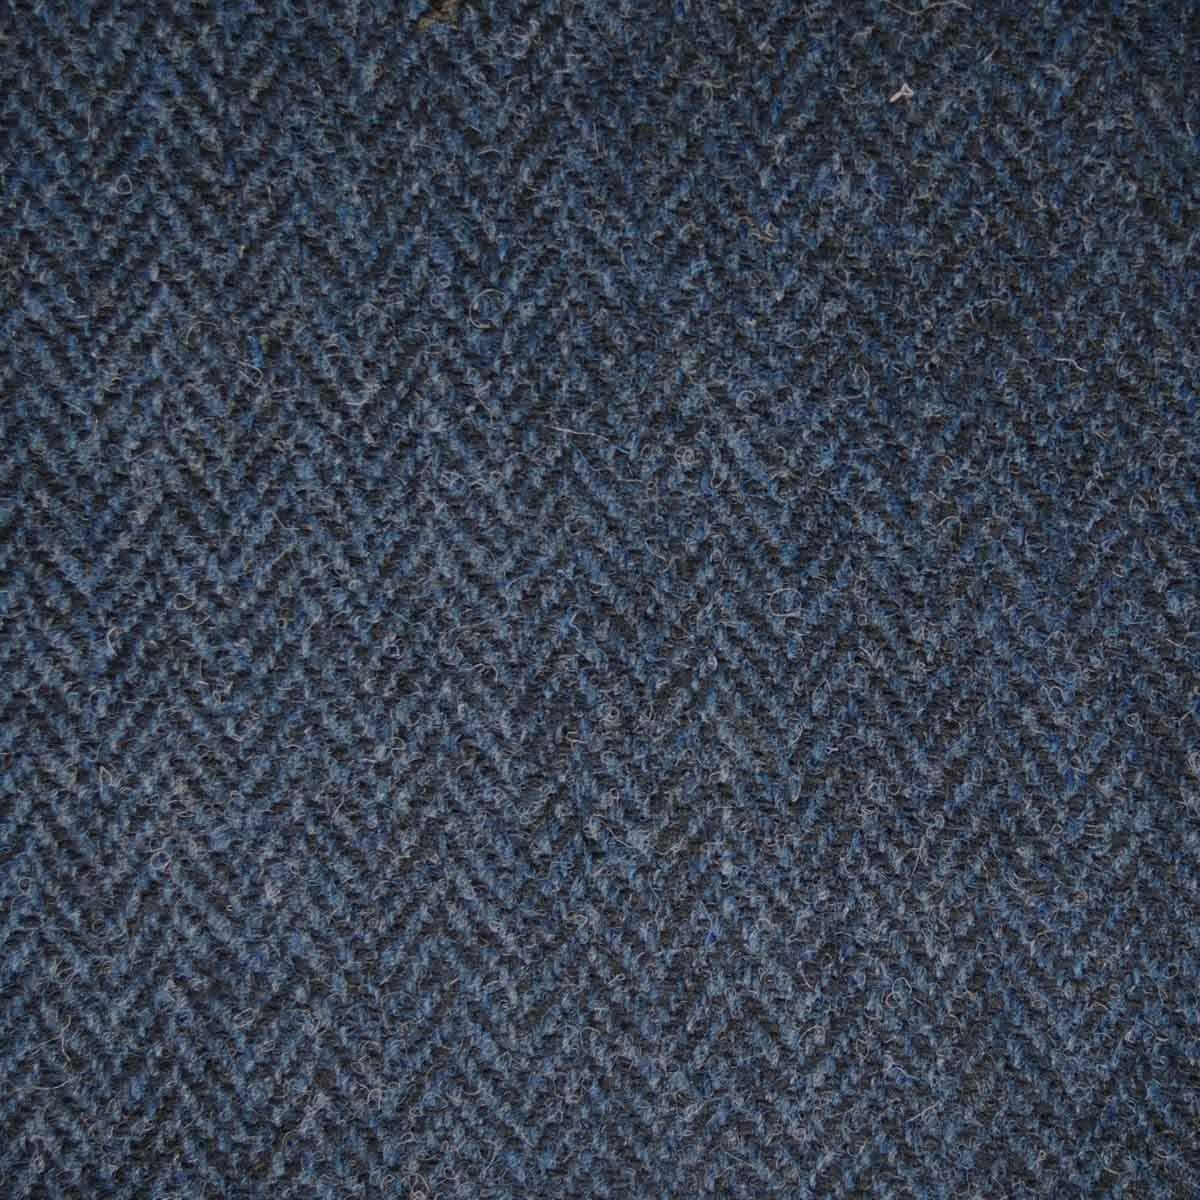 Harris Tweed Fabric /& labels BLUE TARTAN  craft upholstery tailoring patchwork